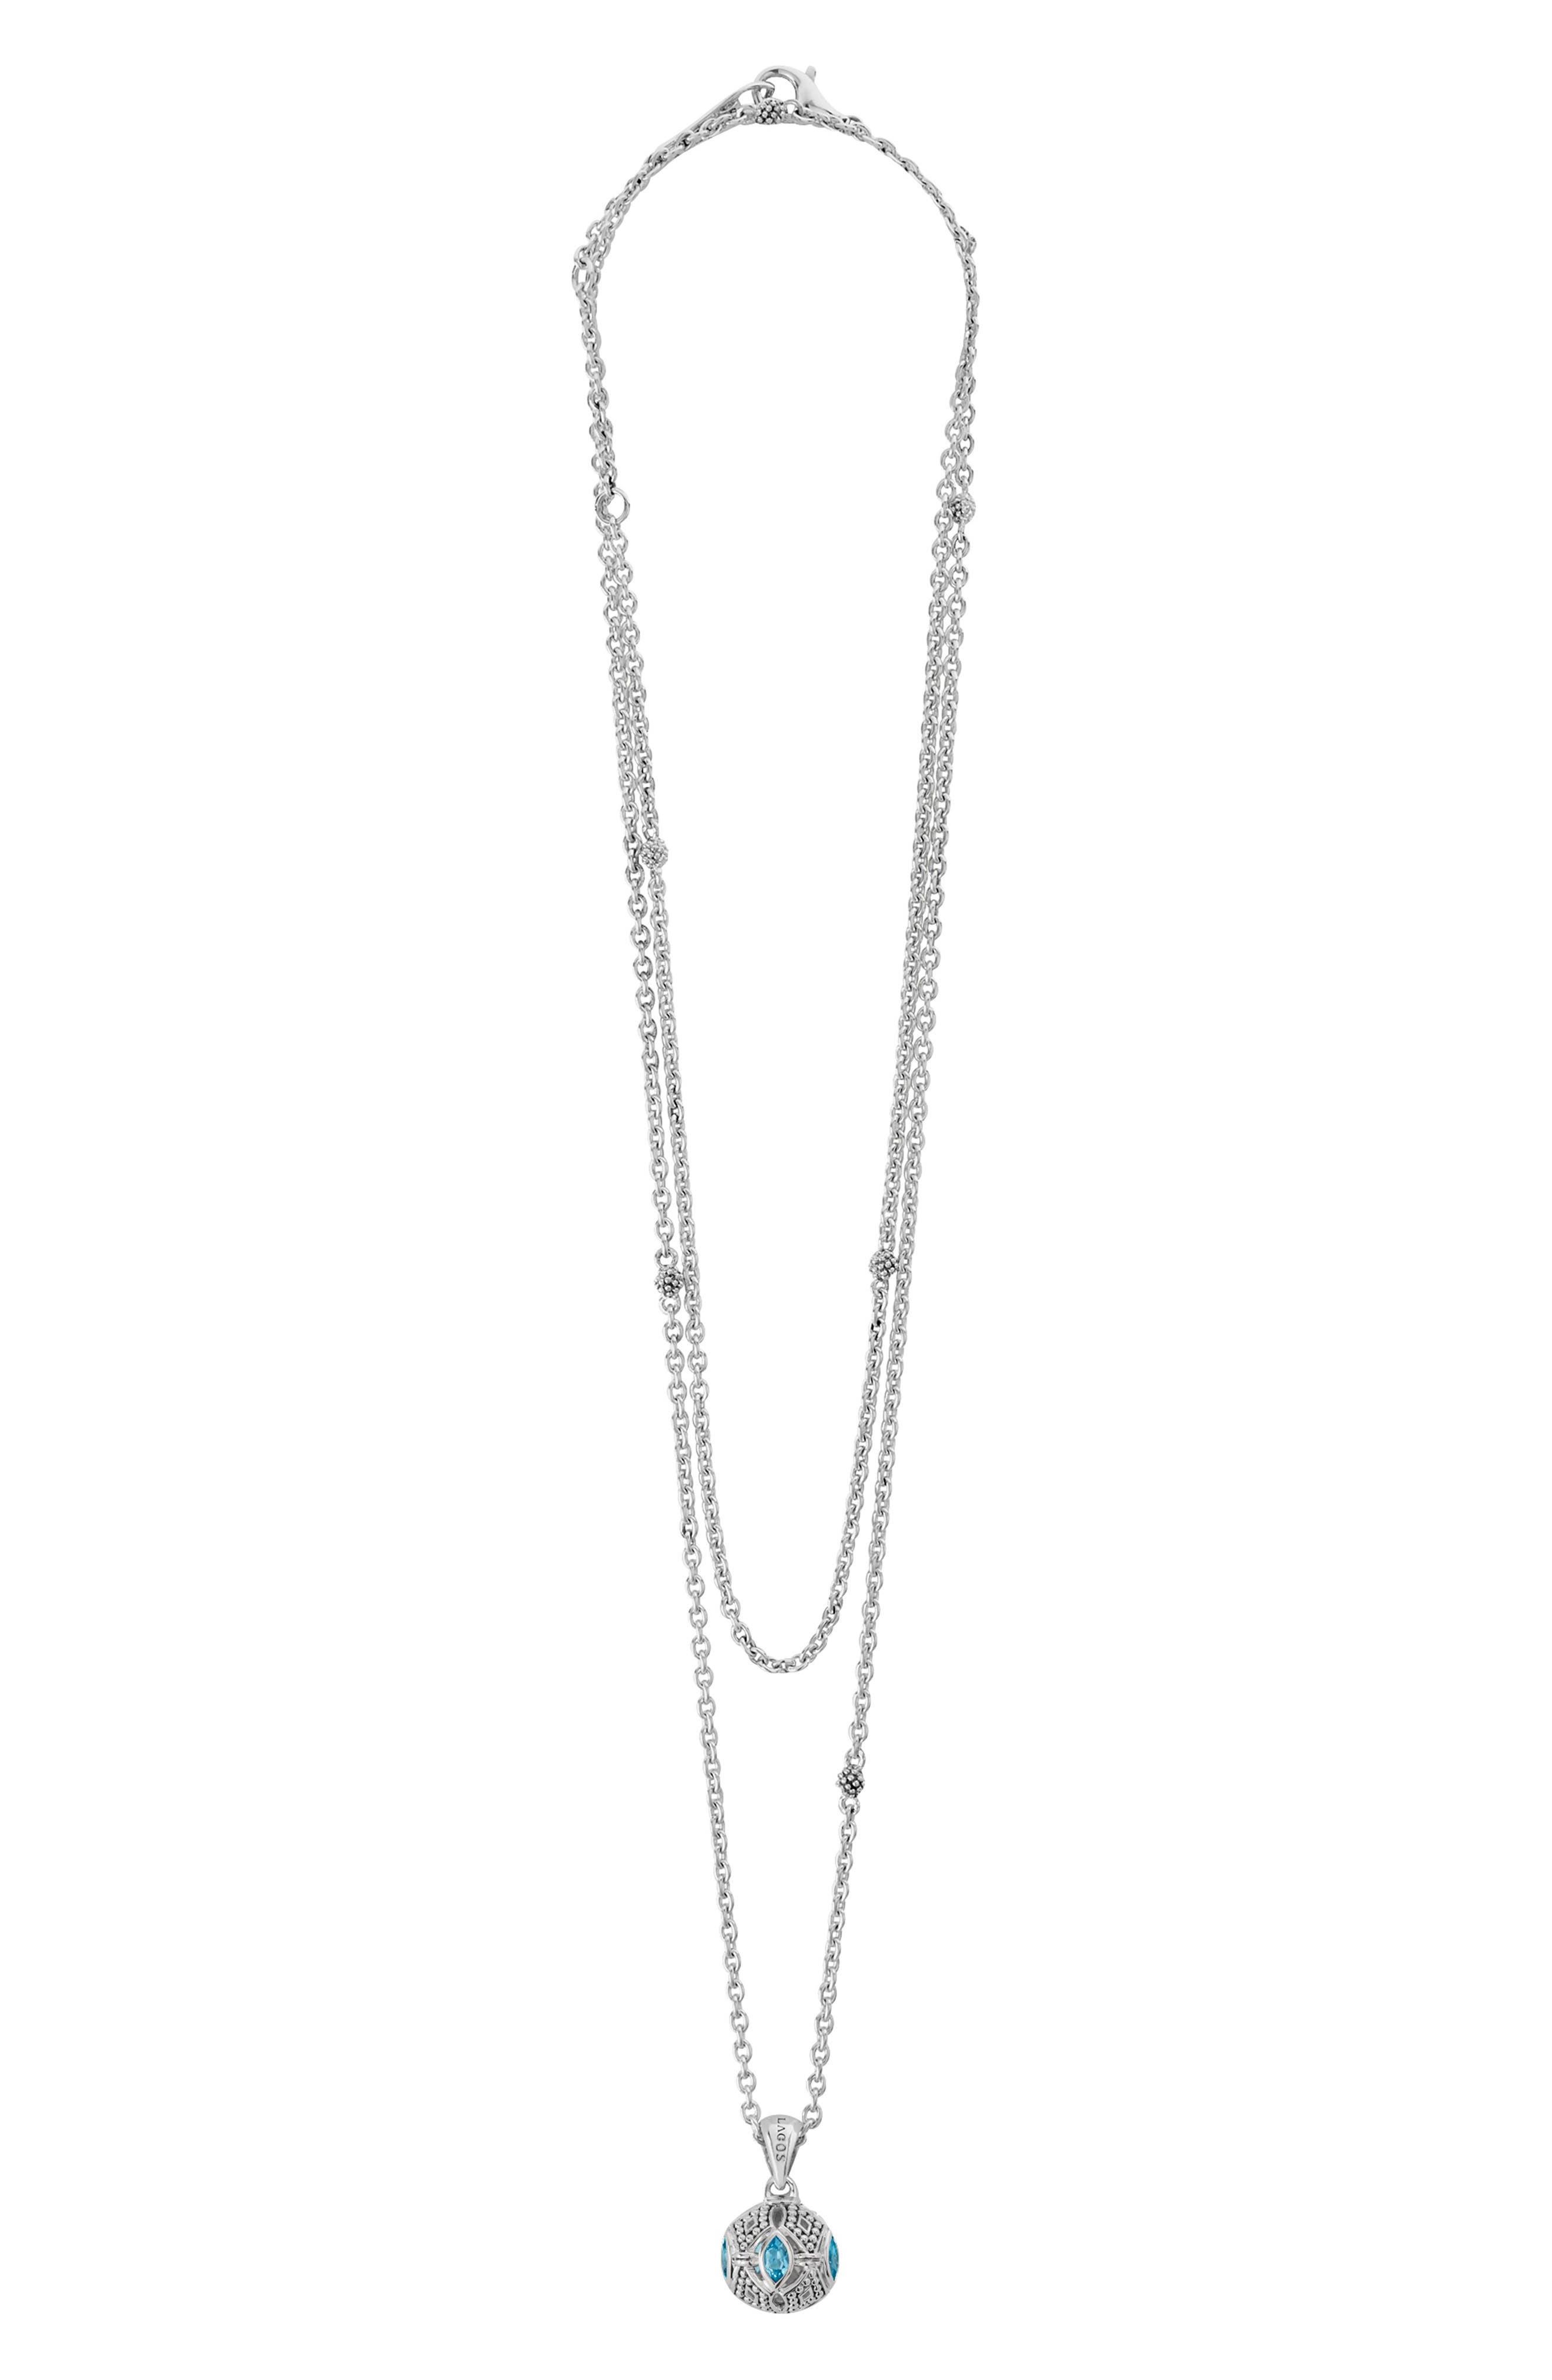 Caviar Talisman Marquee Ball Link Necklace,                         Main,                         color, Silver/ Blue Topaz